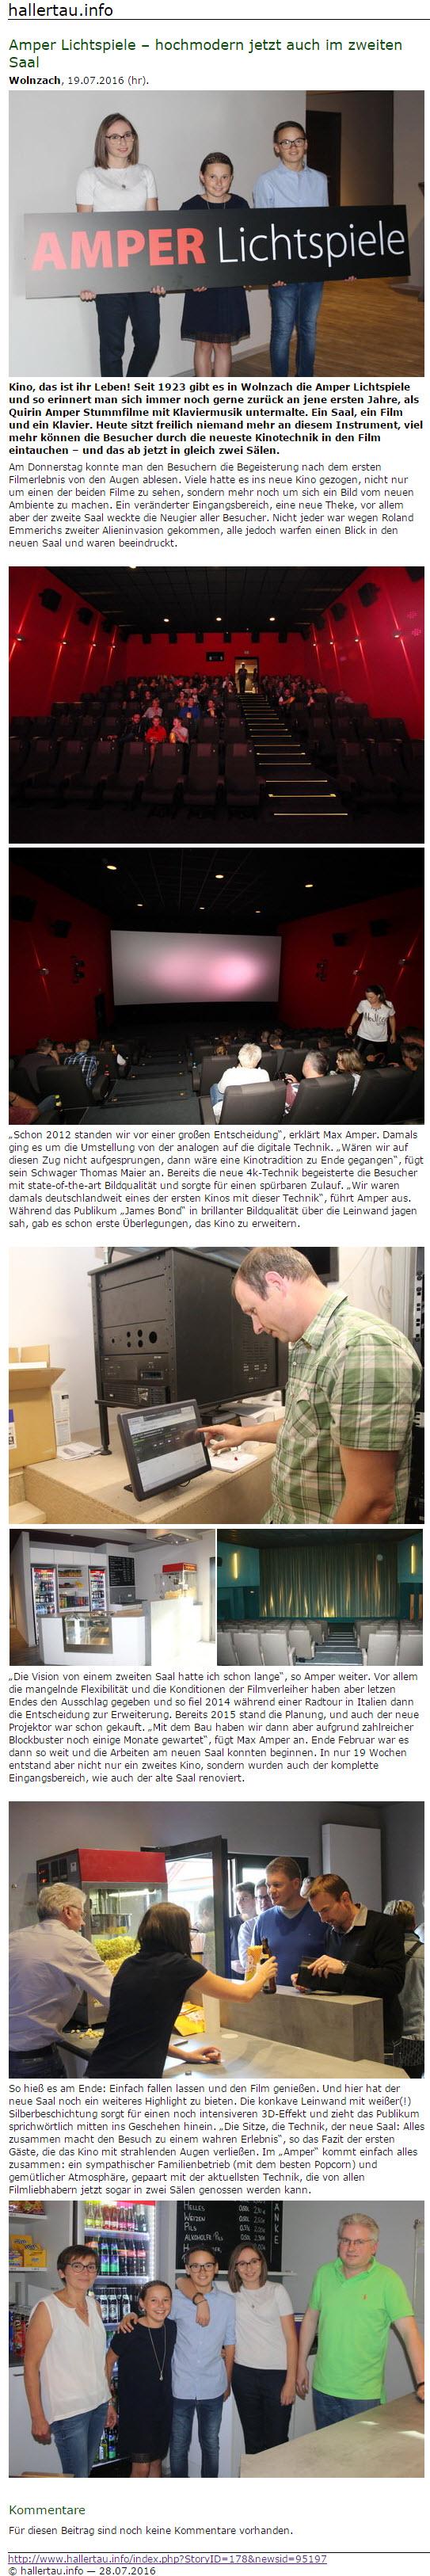 Artikel hallertau.info